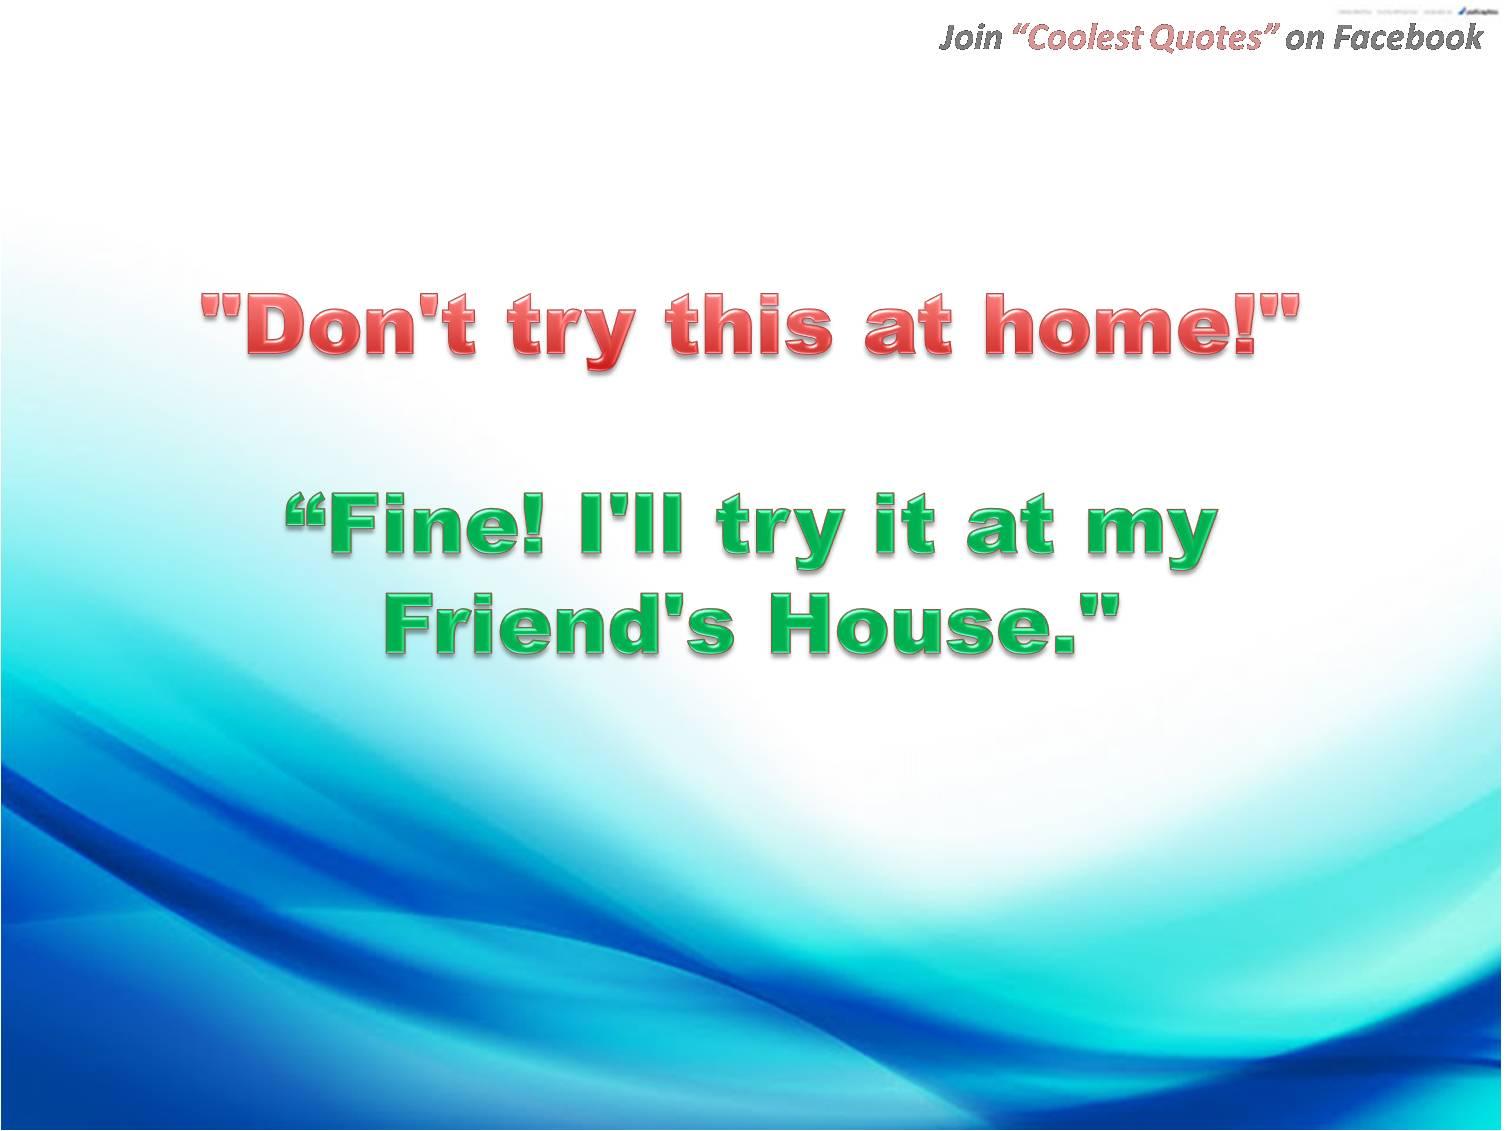 Coolest quote #3